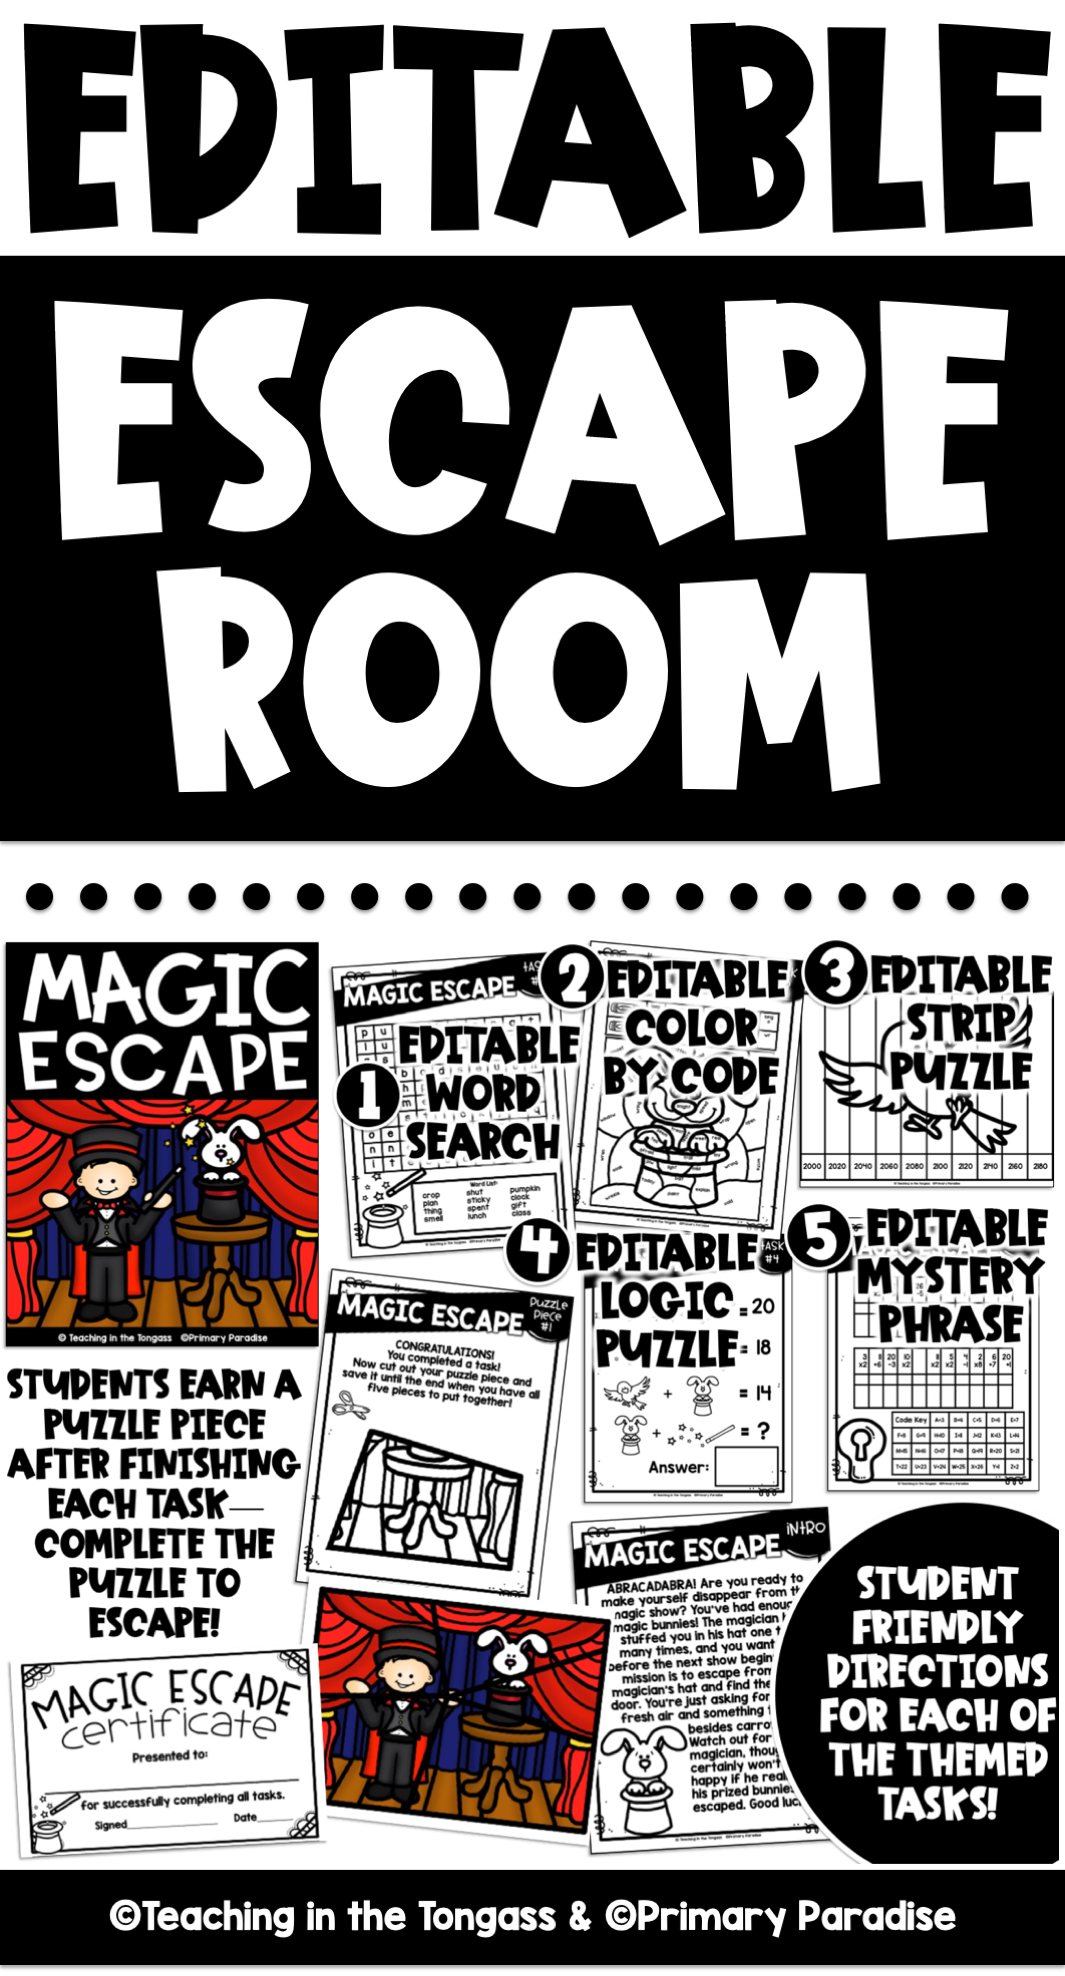 Magic Escape Room For Kids Escape Room Zoo Activities Winter Activities For Kids